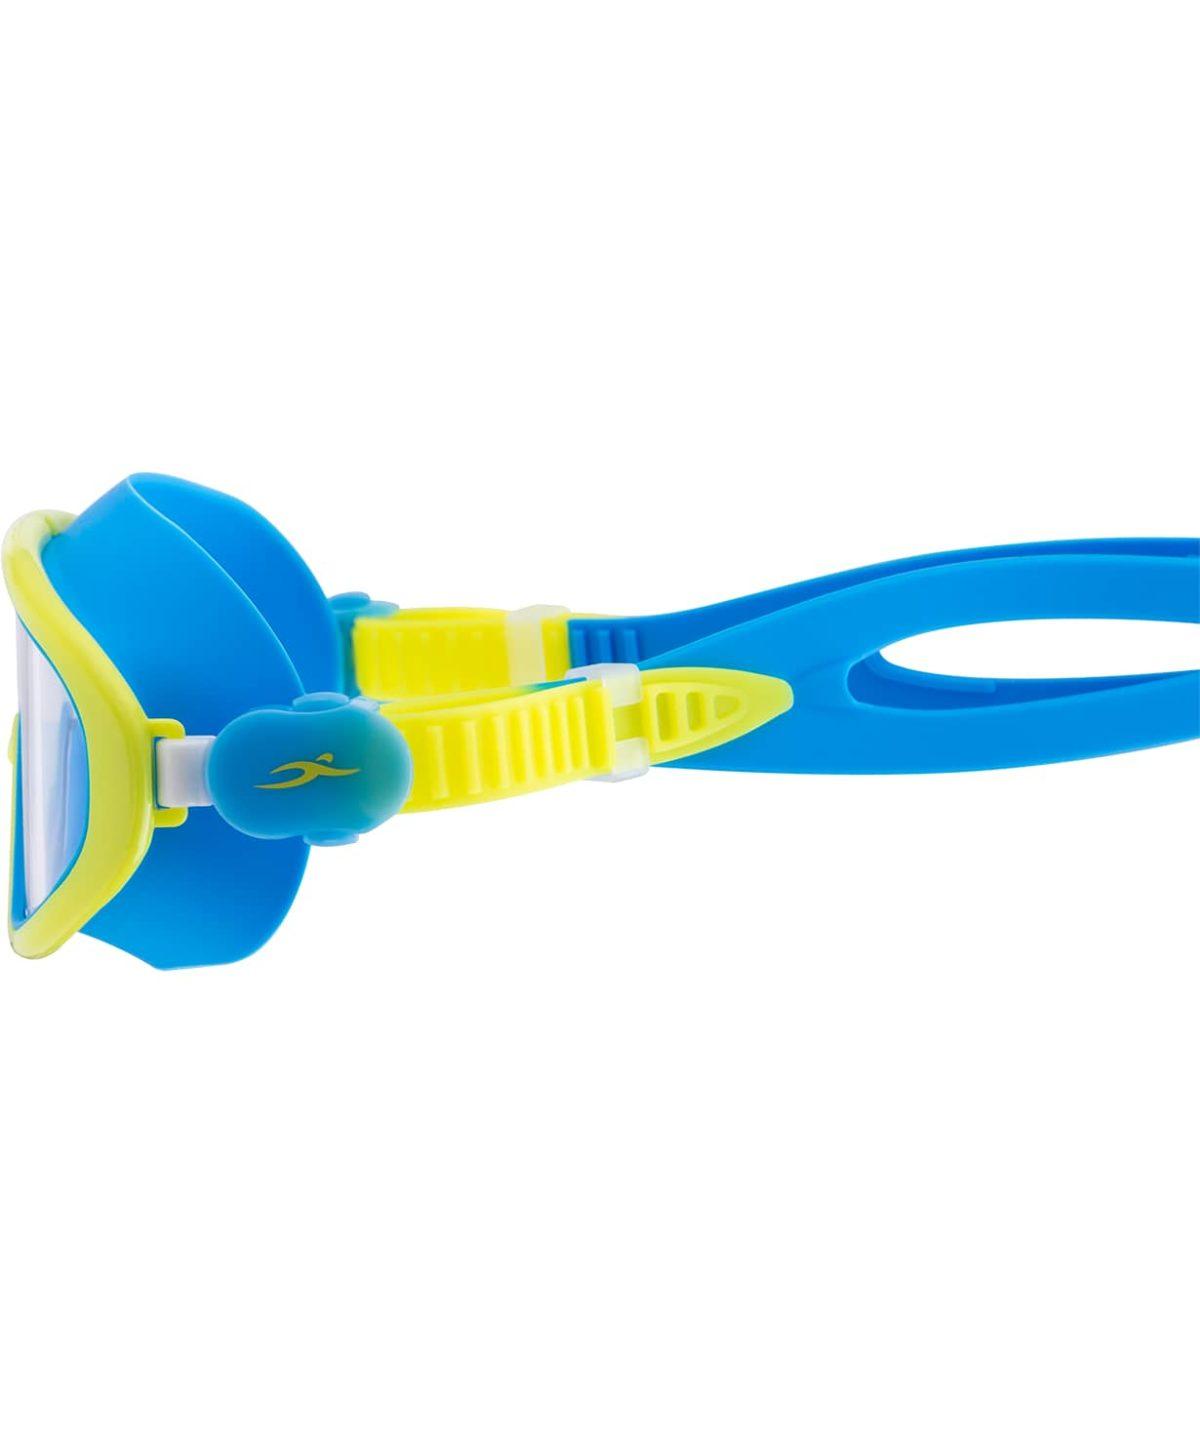 25DEGREES Очки-маска для плавания Hyper, детская  25D21018: голубой/лайм - 4